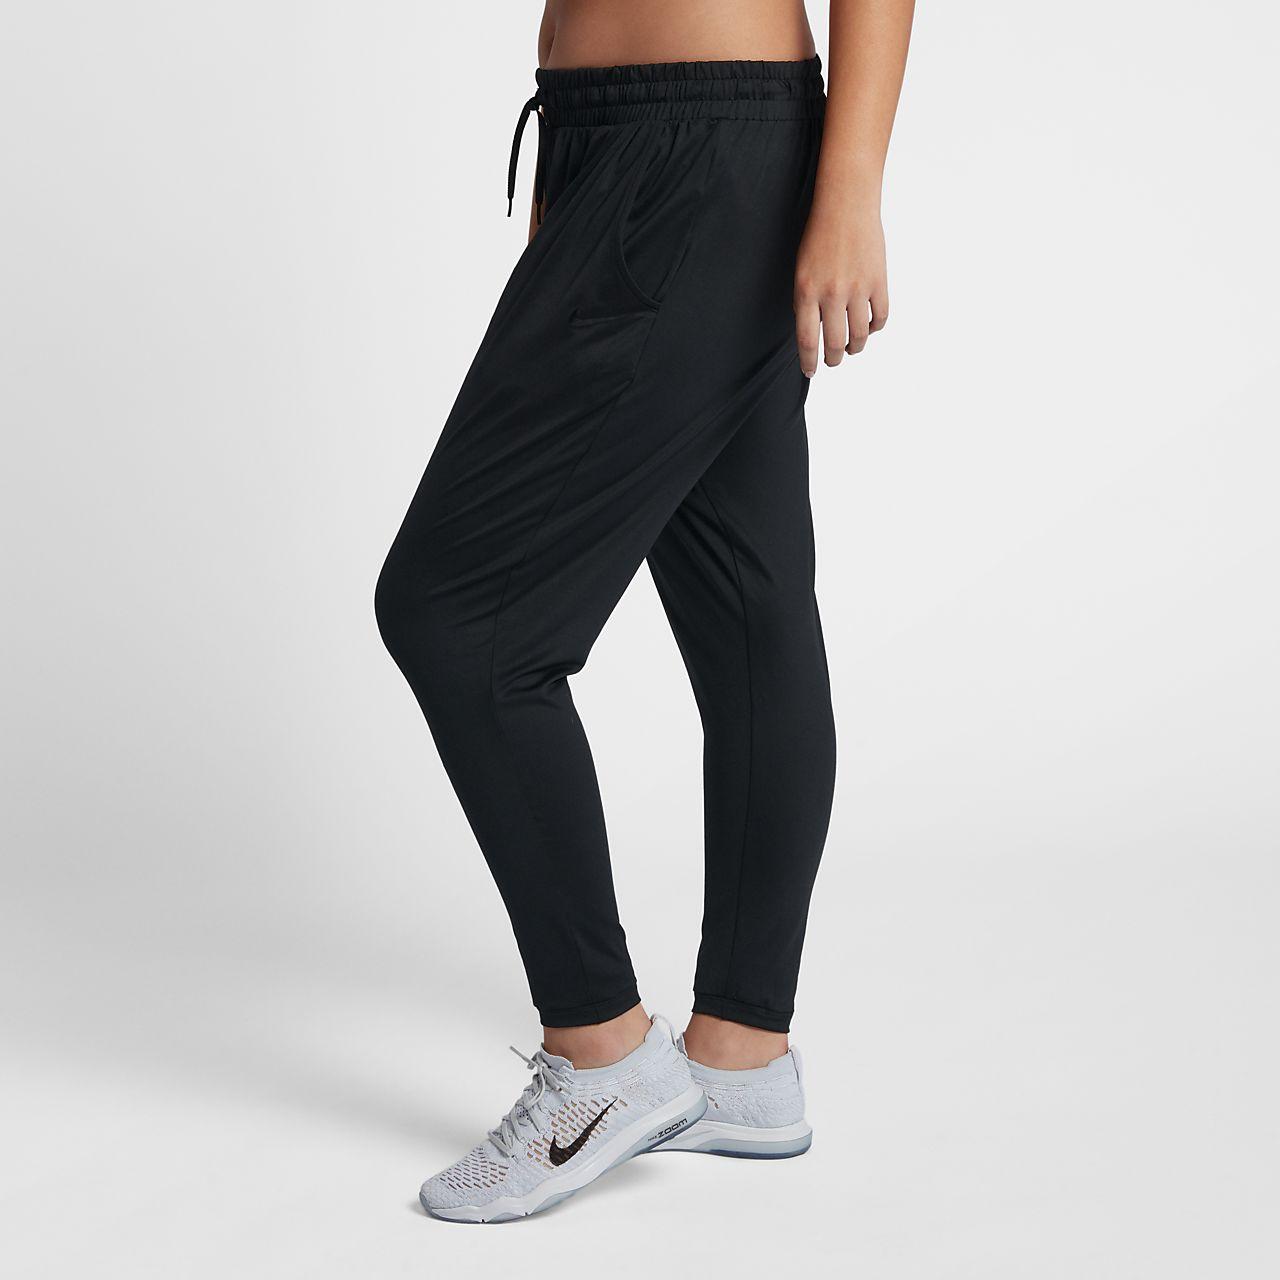 Nike Dri-FIT Women Training Trousers